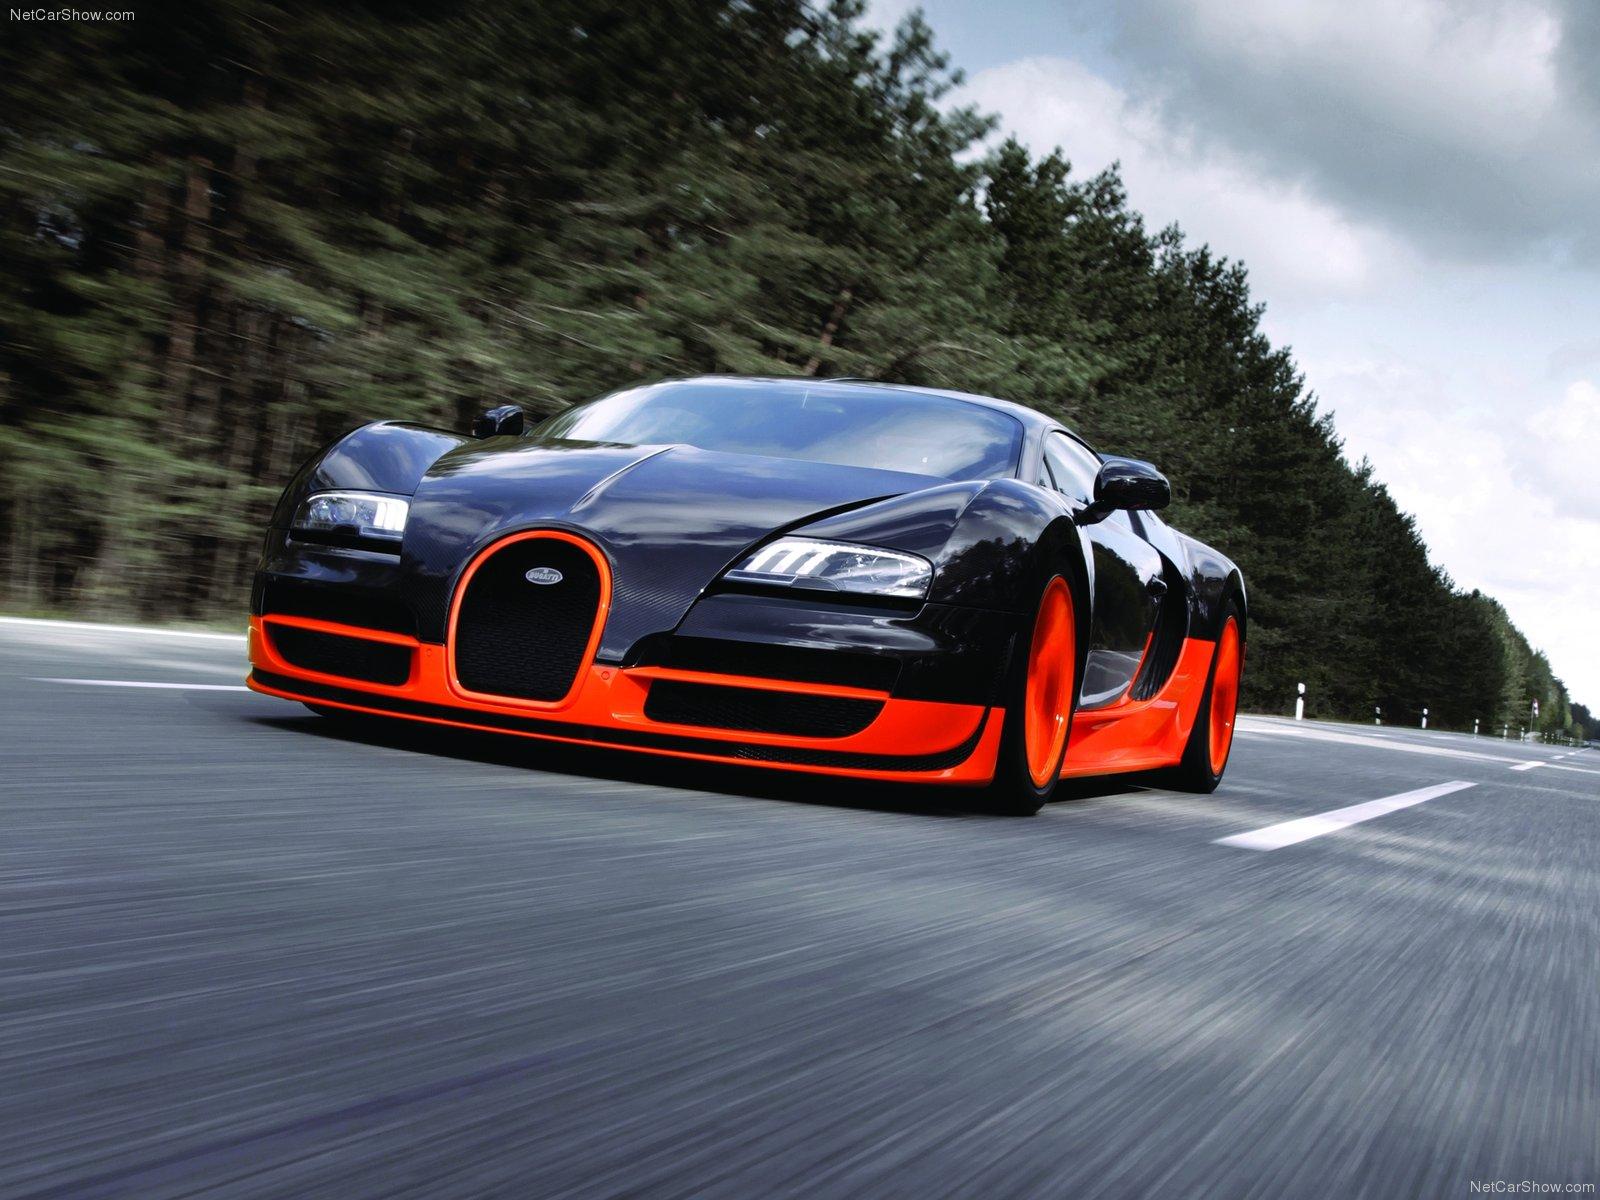 bugatti veyron super sport hd wallpaper cars wallpapers - Bugatti Veyron Wallpaper